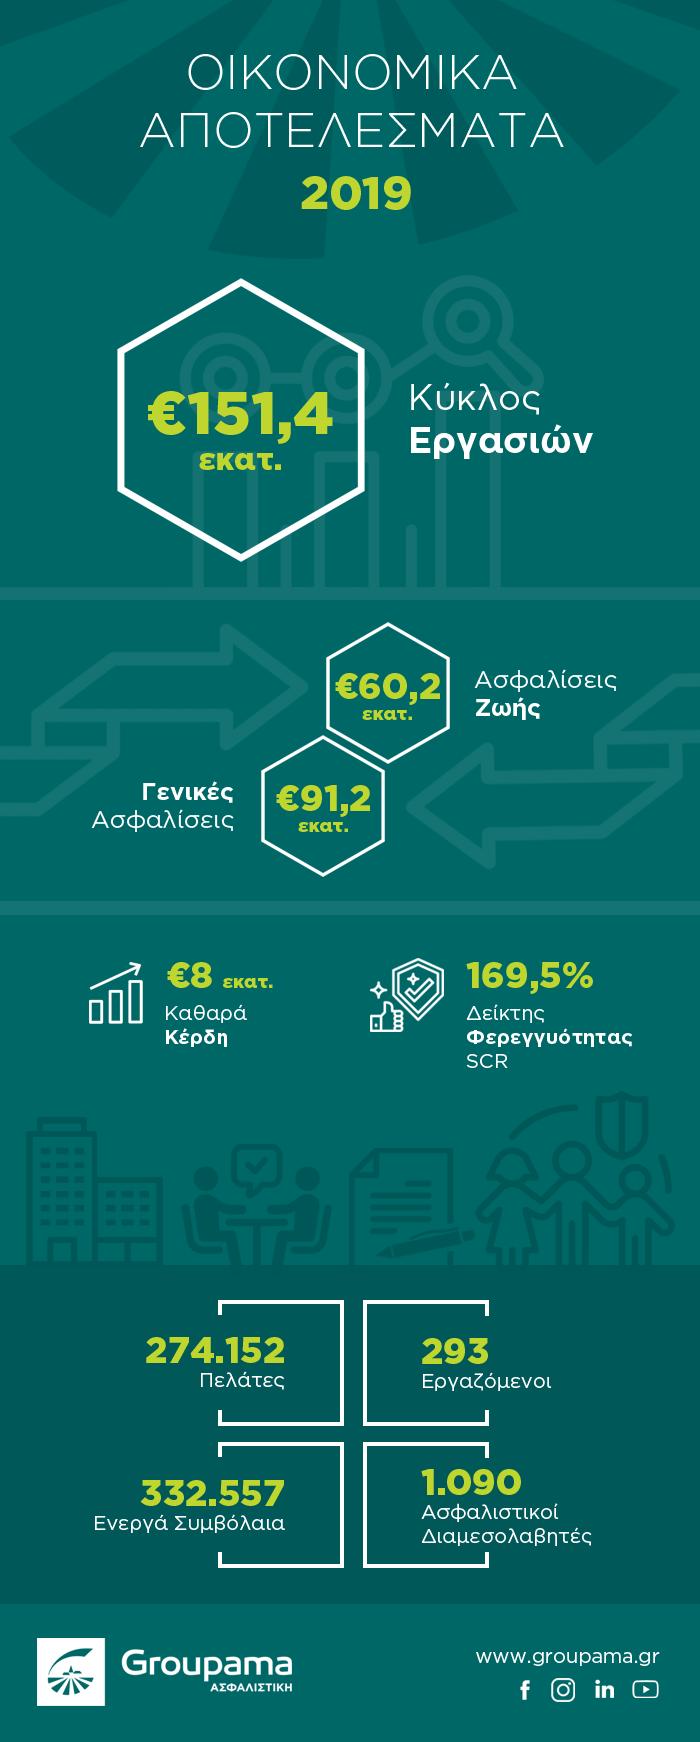 Groupama Ασφαλιστική: Θετικά οικονομικά αποτελέσματα και το 2019 1